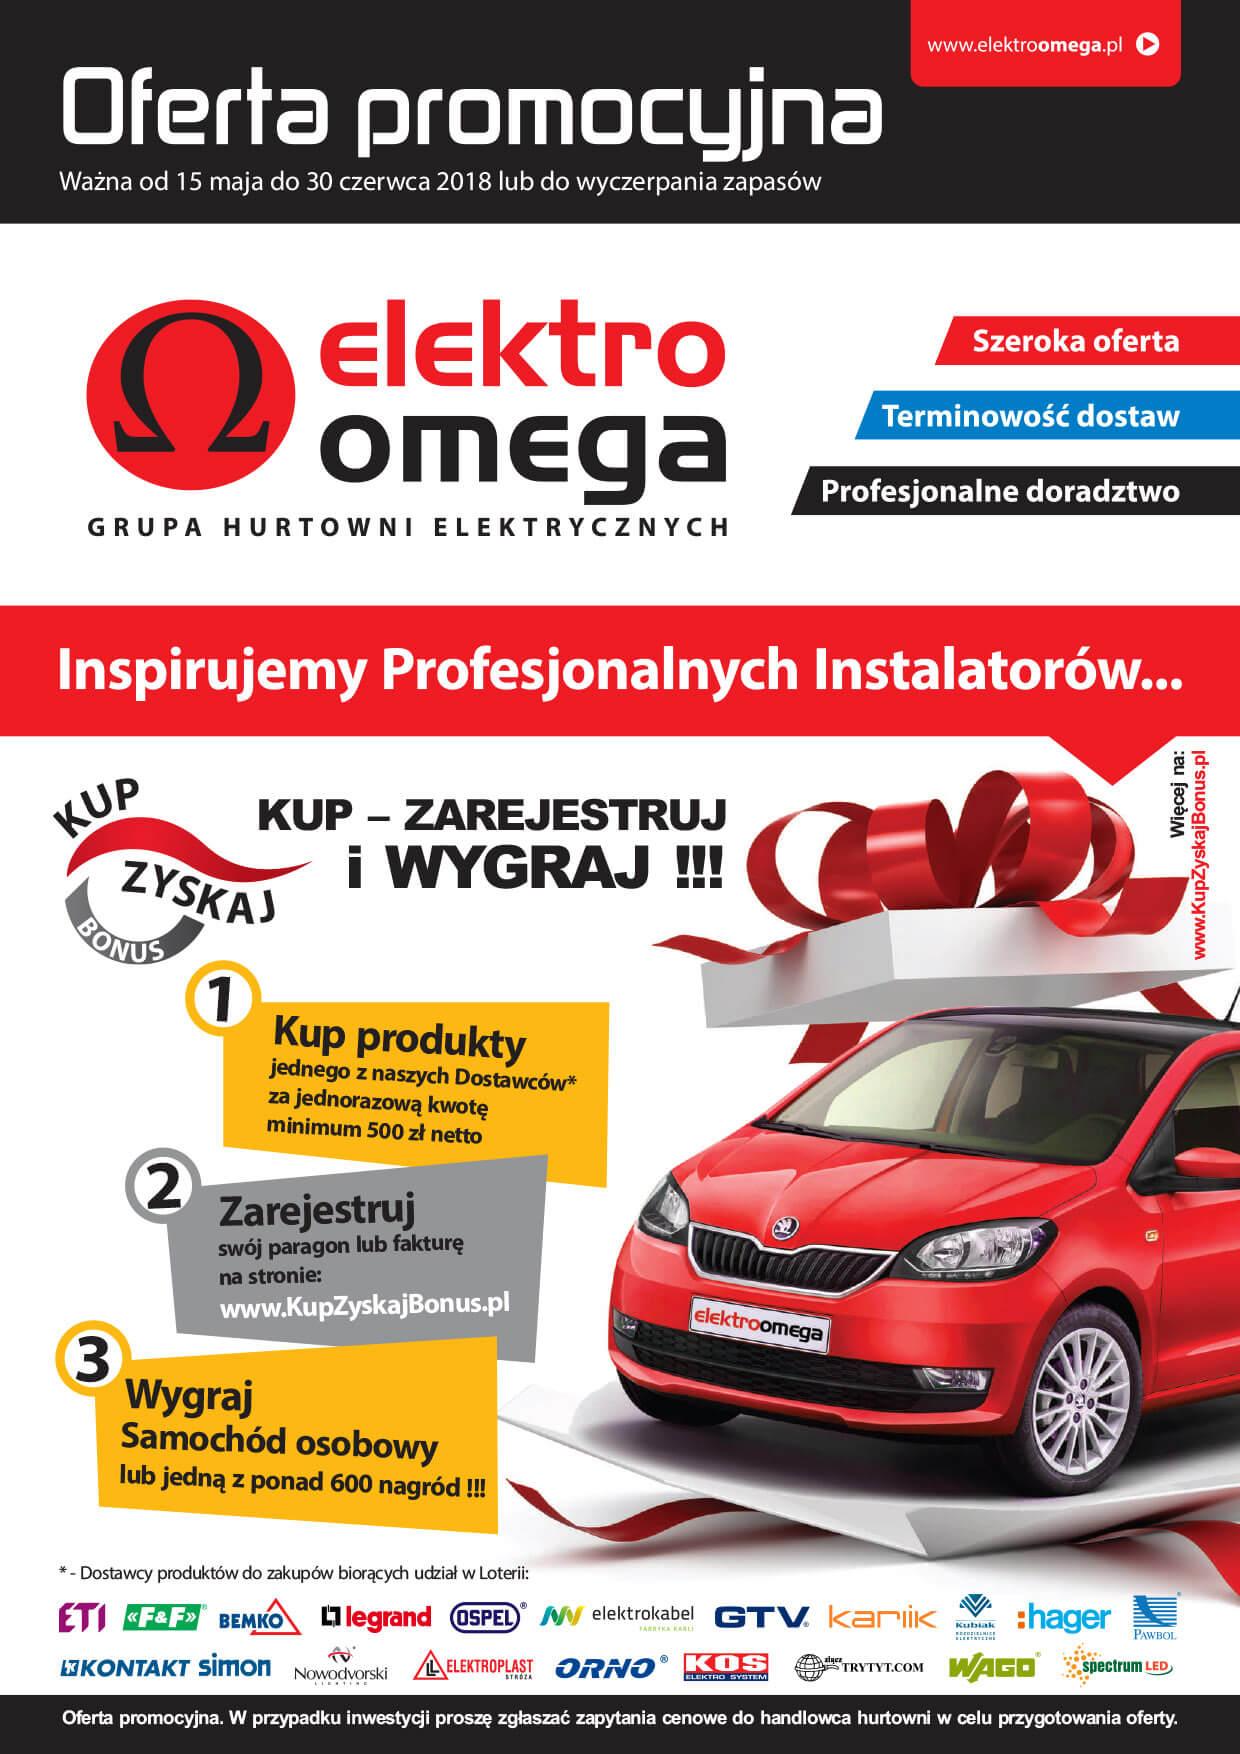 Oferta Promocyjna Elektro Omega od 15.05.2018 do 30.06.2018